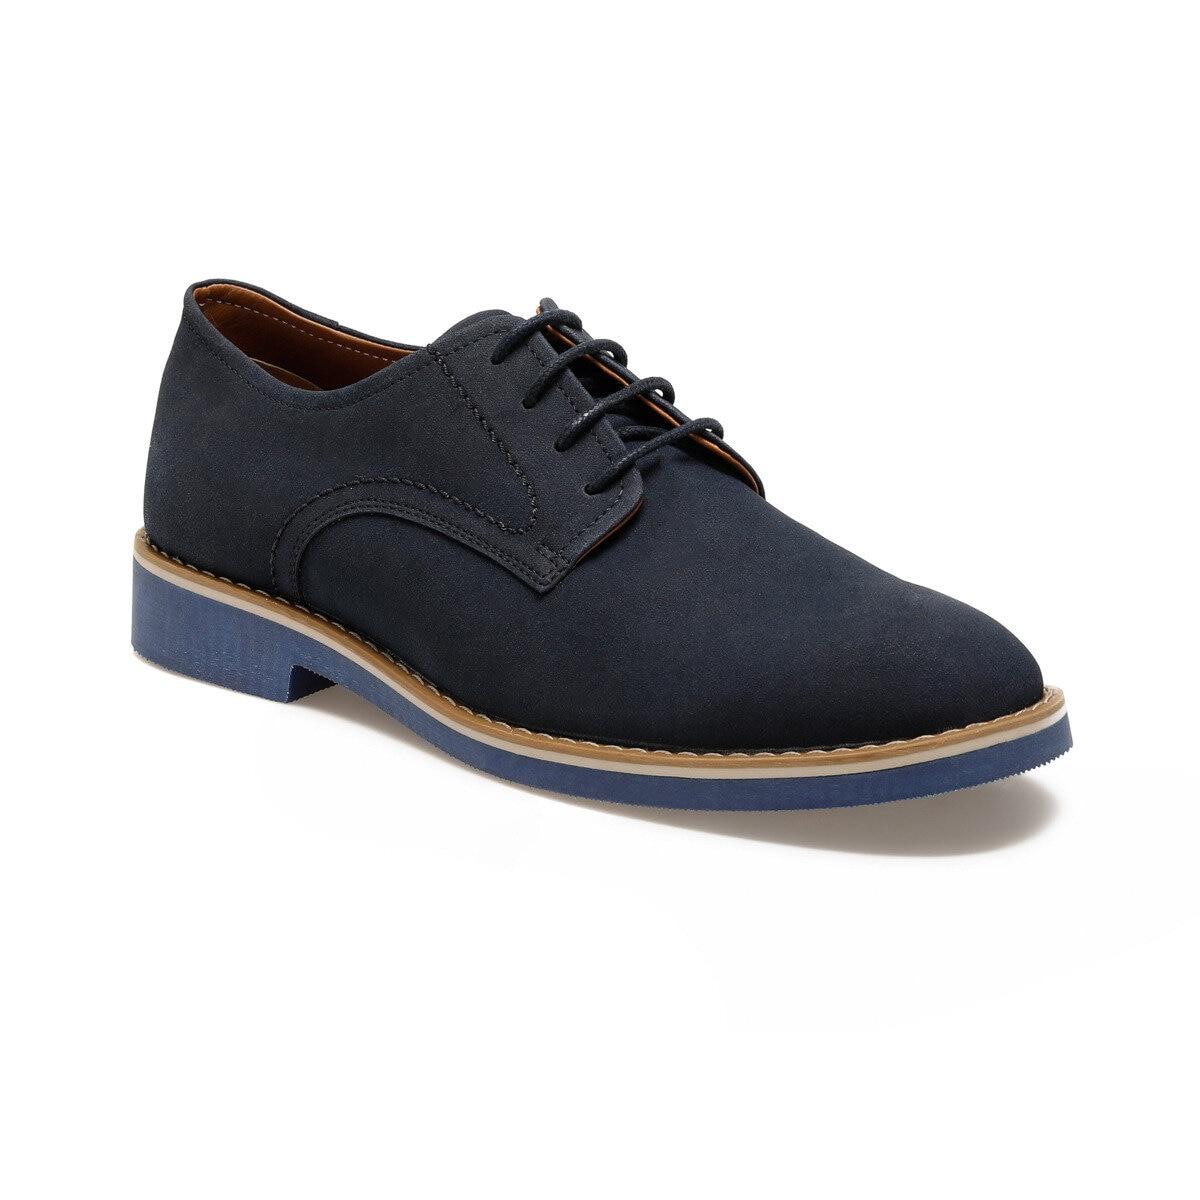 FLO MST-1 Navy Blue Men 'S Dress Shoes JJ-Stiller